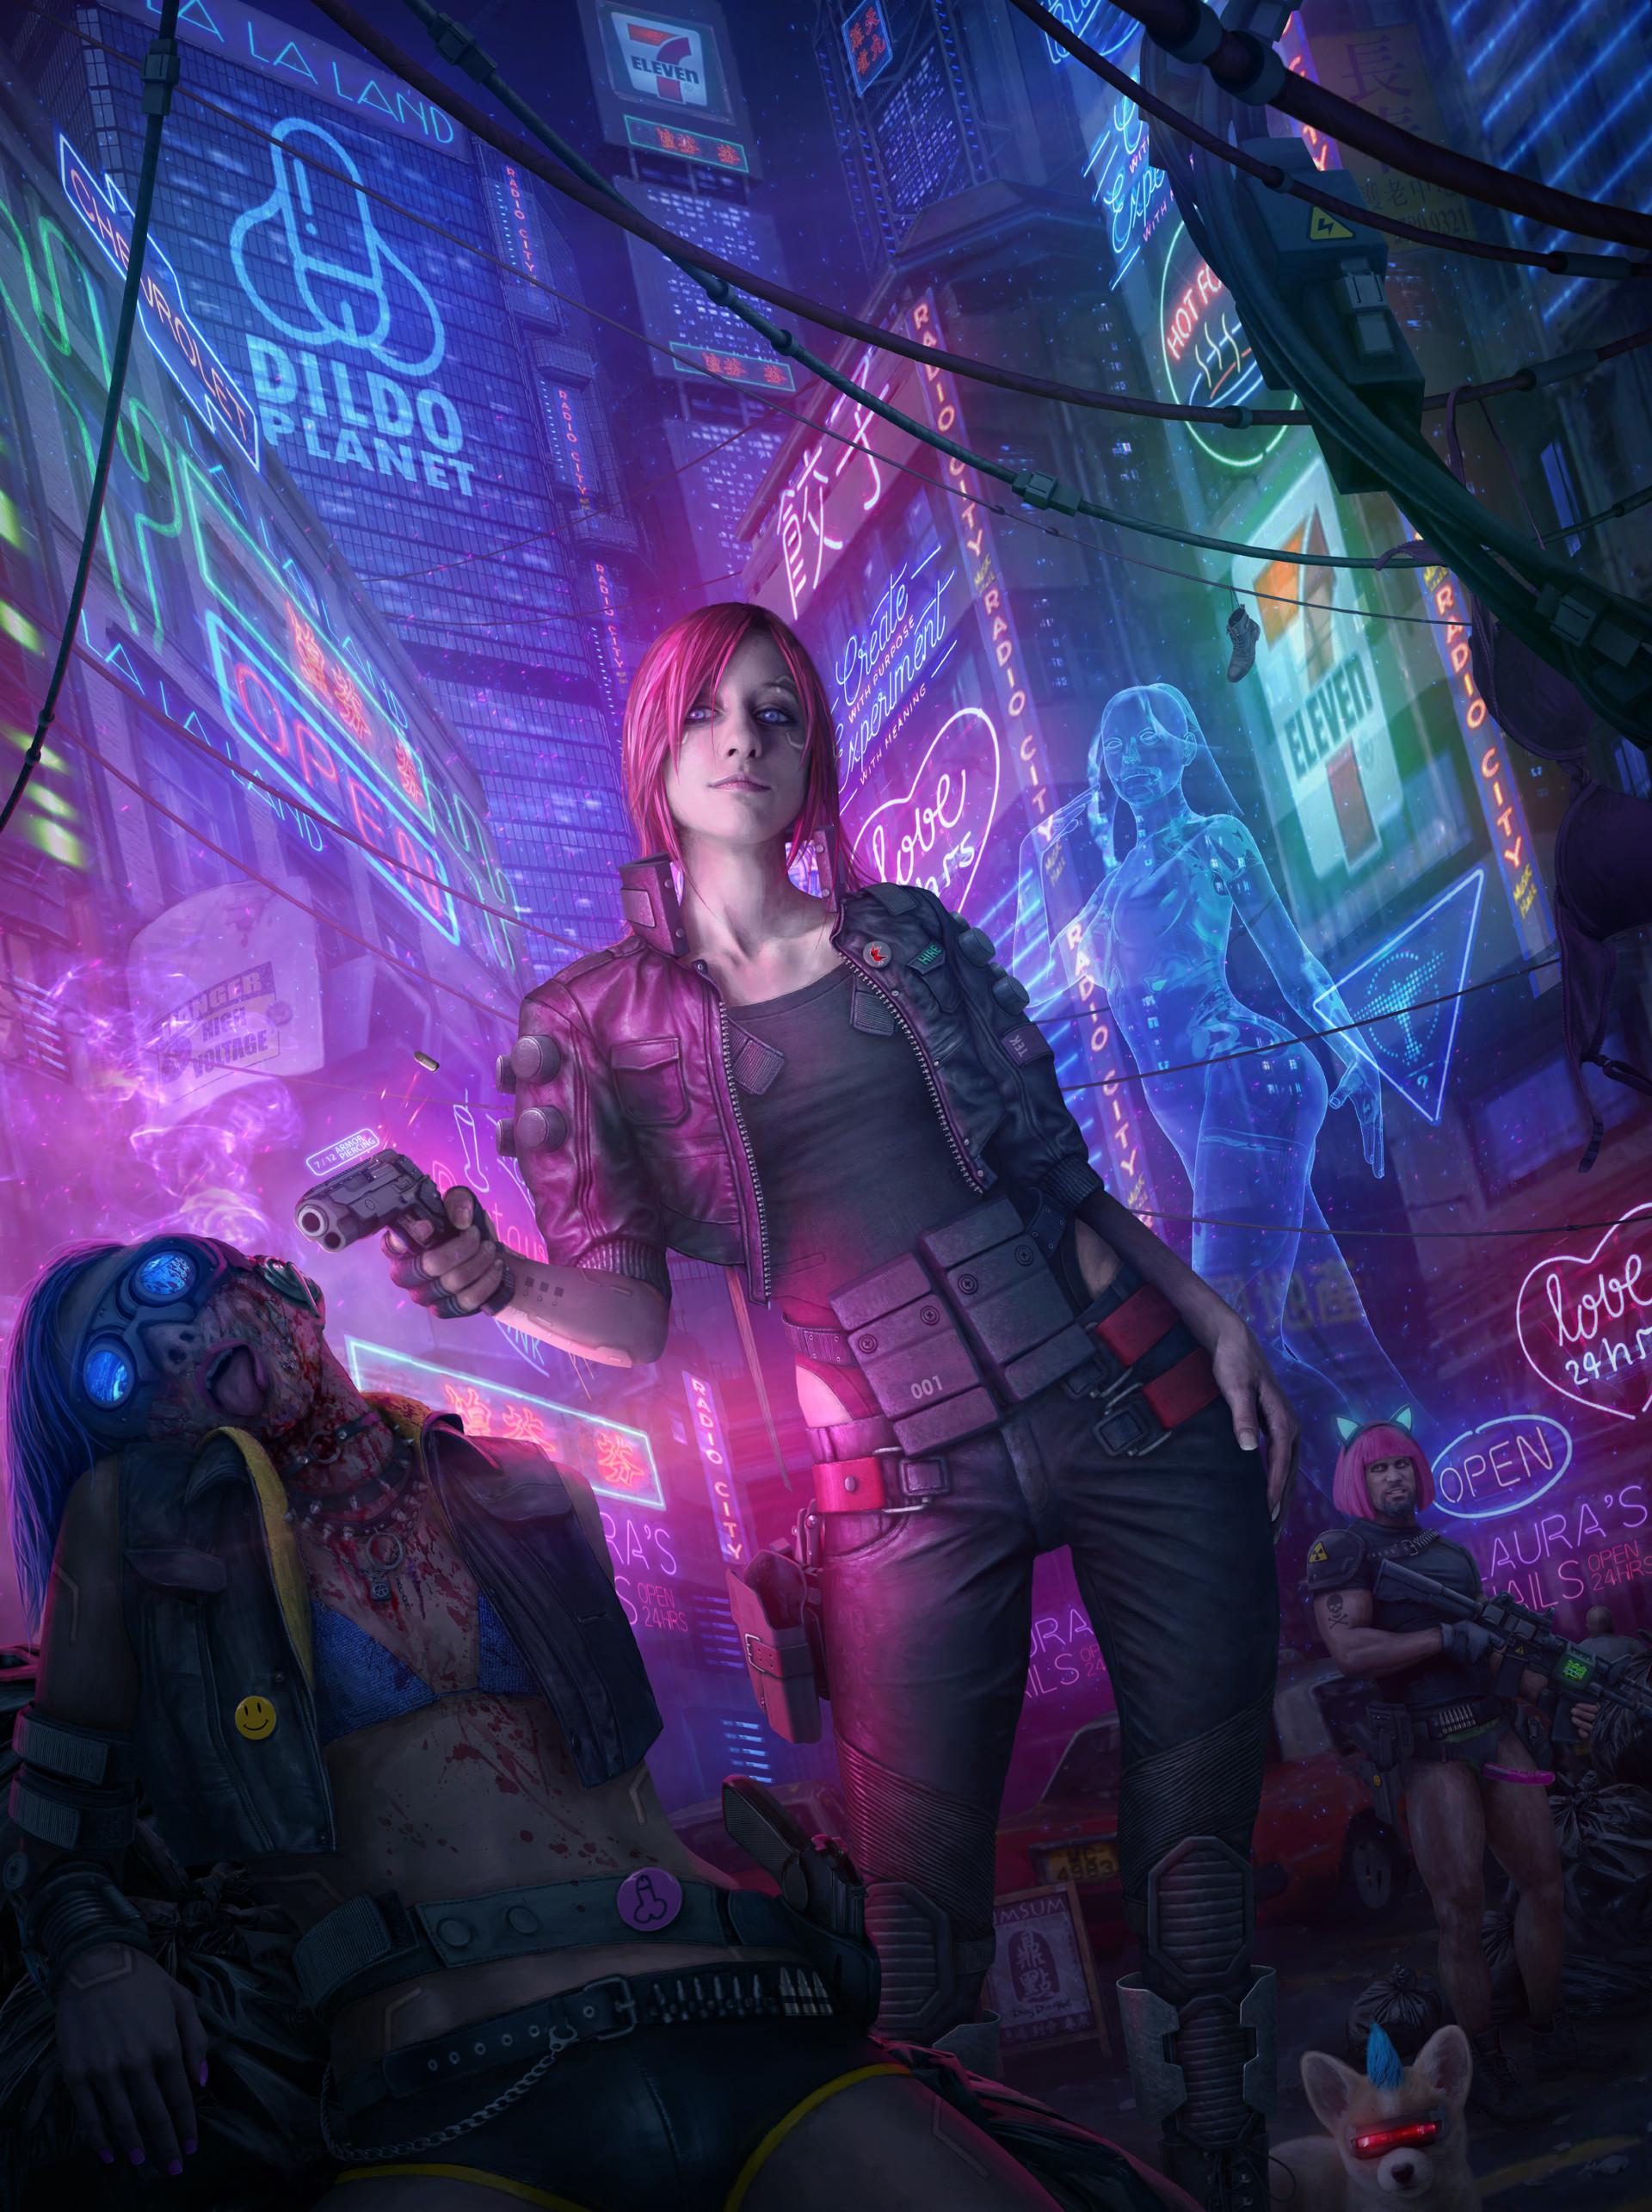 General 1920x2571 cyberpunk futuristic gun murder digital art hologram Tek Tan city neon lights futuristic city women